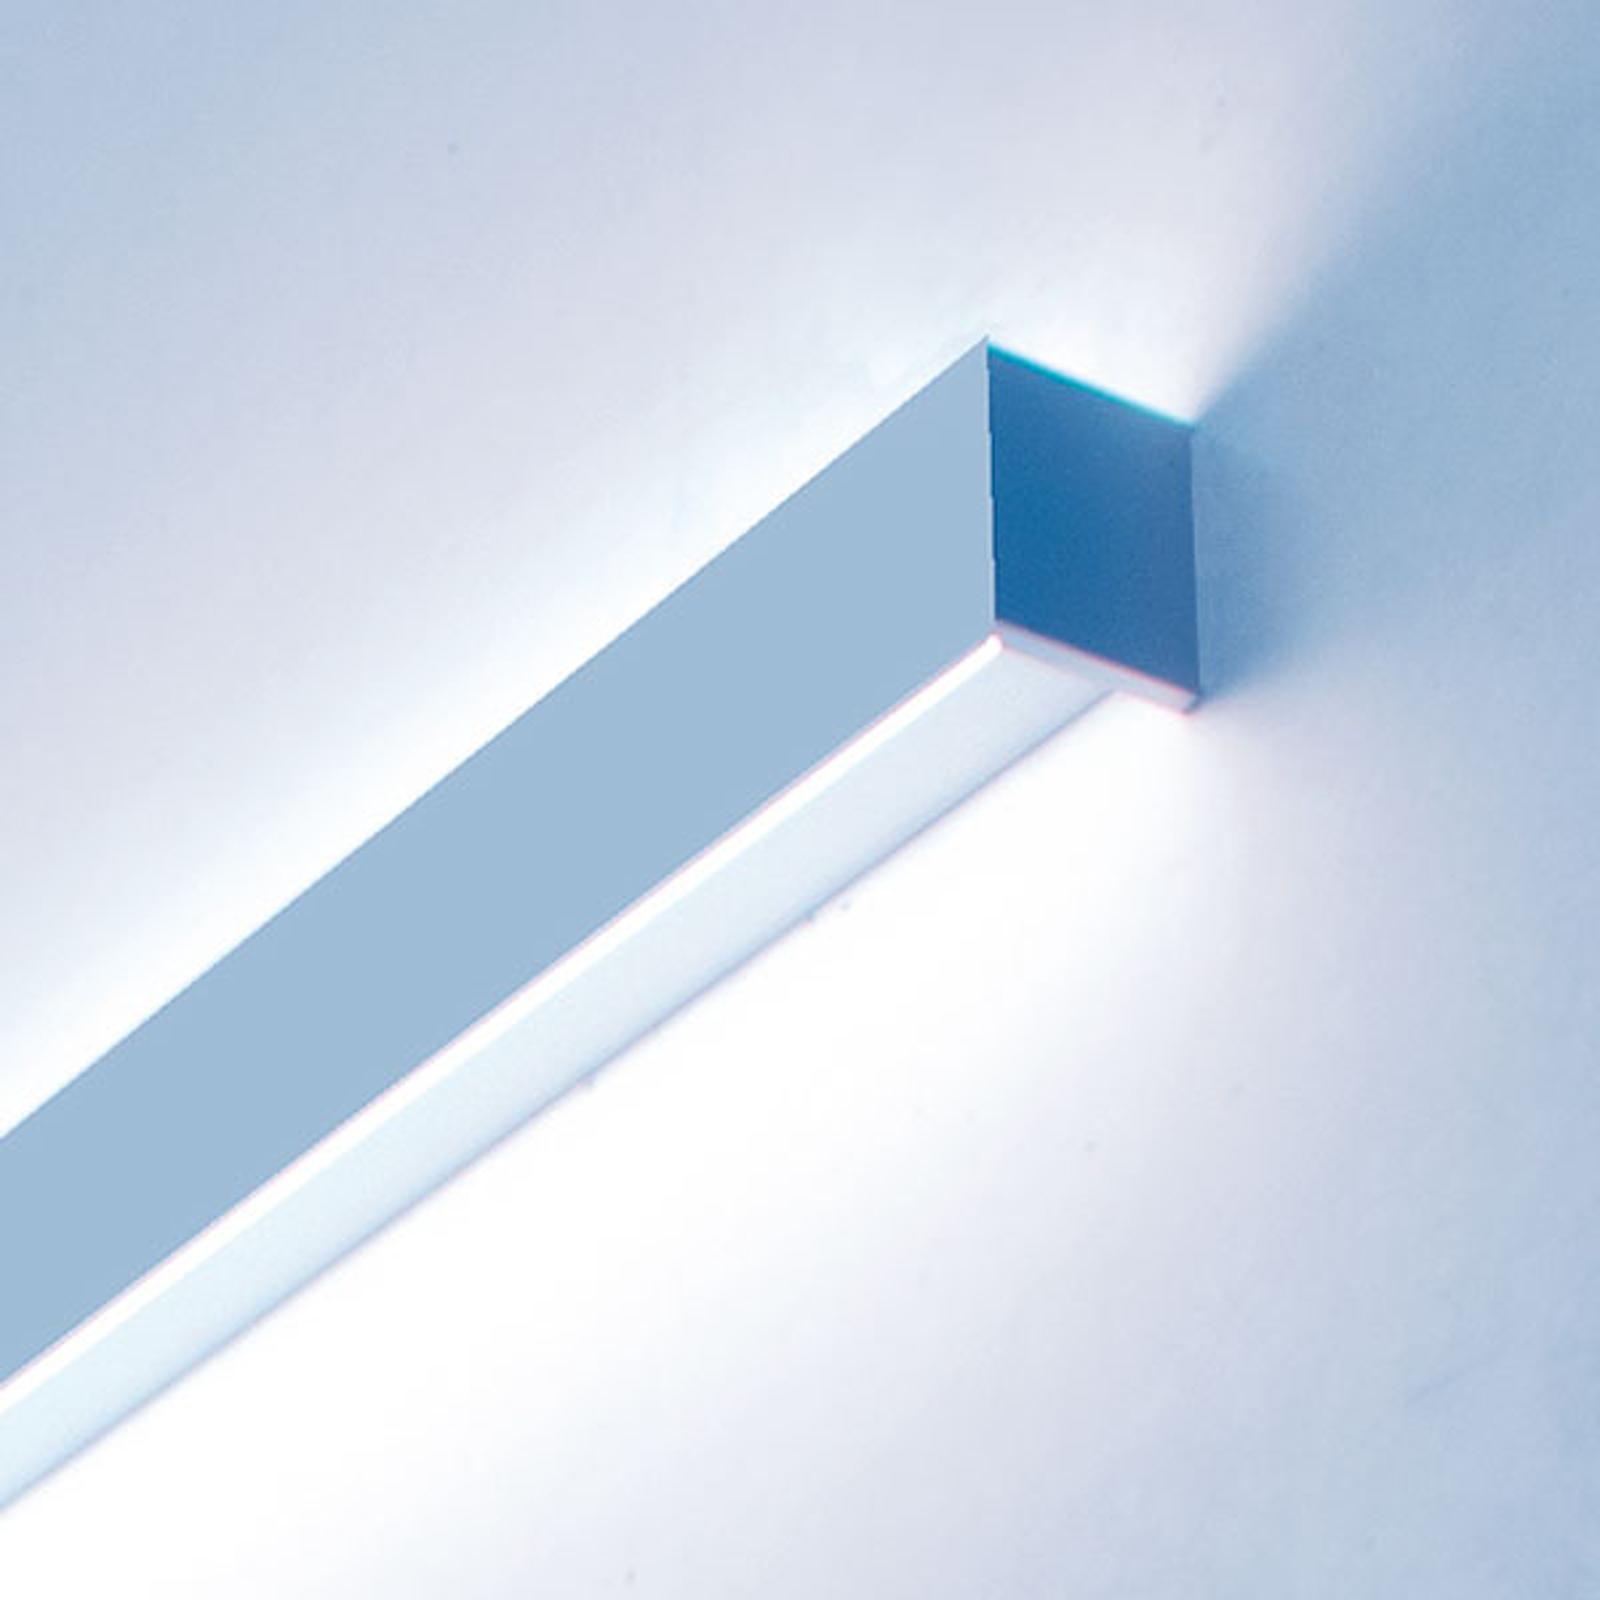 Applique LED Matric W1 60cm, 3000K